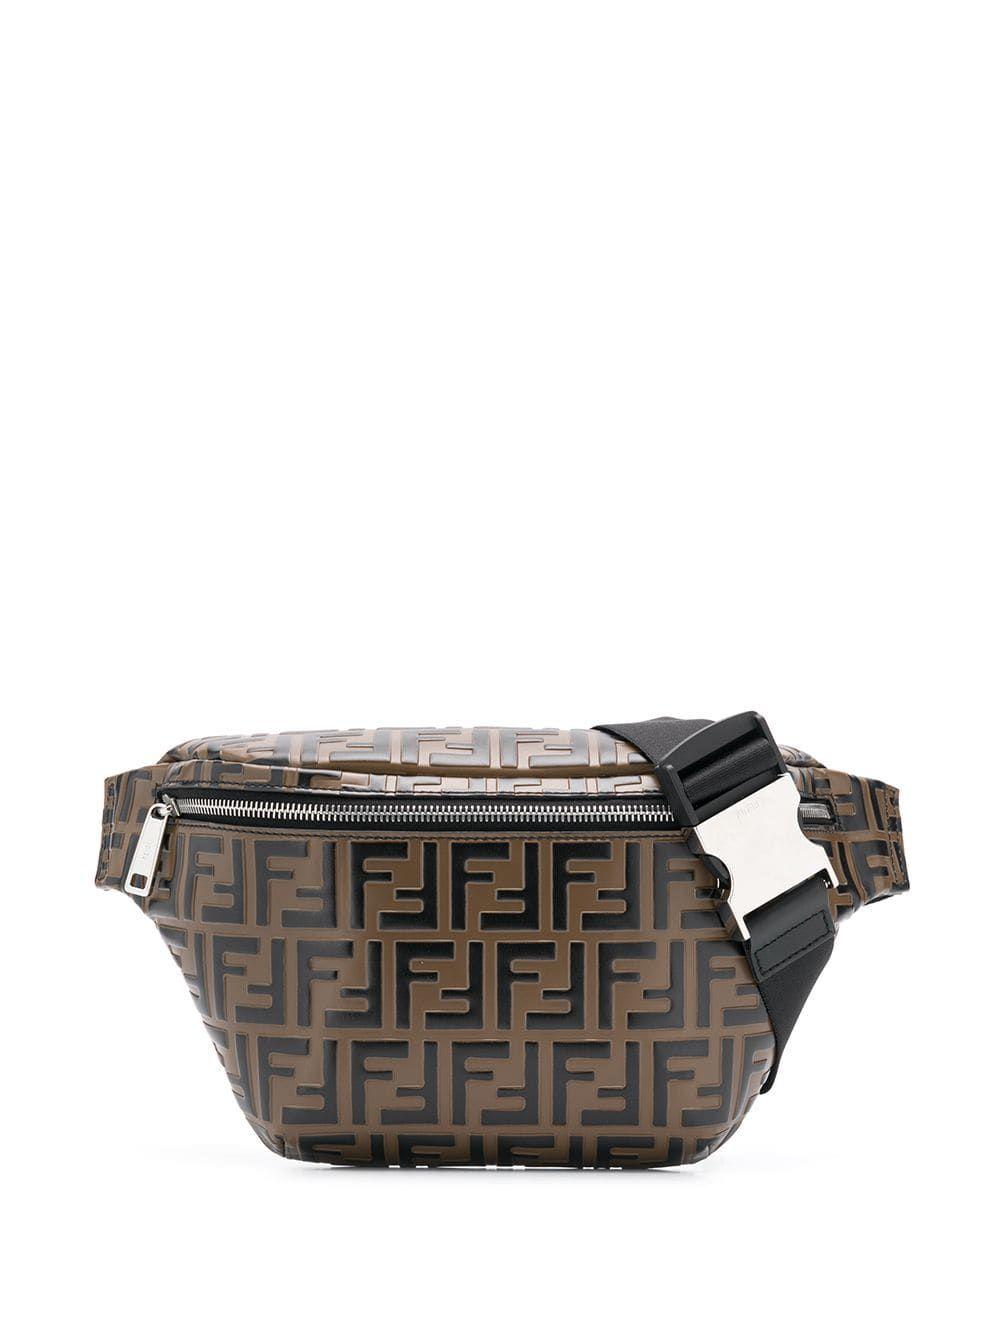 00072201 FENDI FENDI FF MONOGRAM BELT BAG - BROWN. #fendi #bags #leather ...